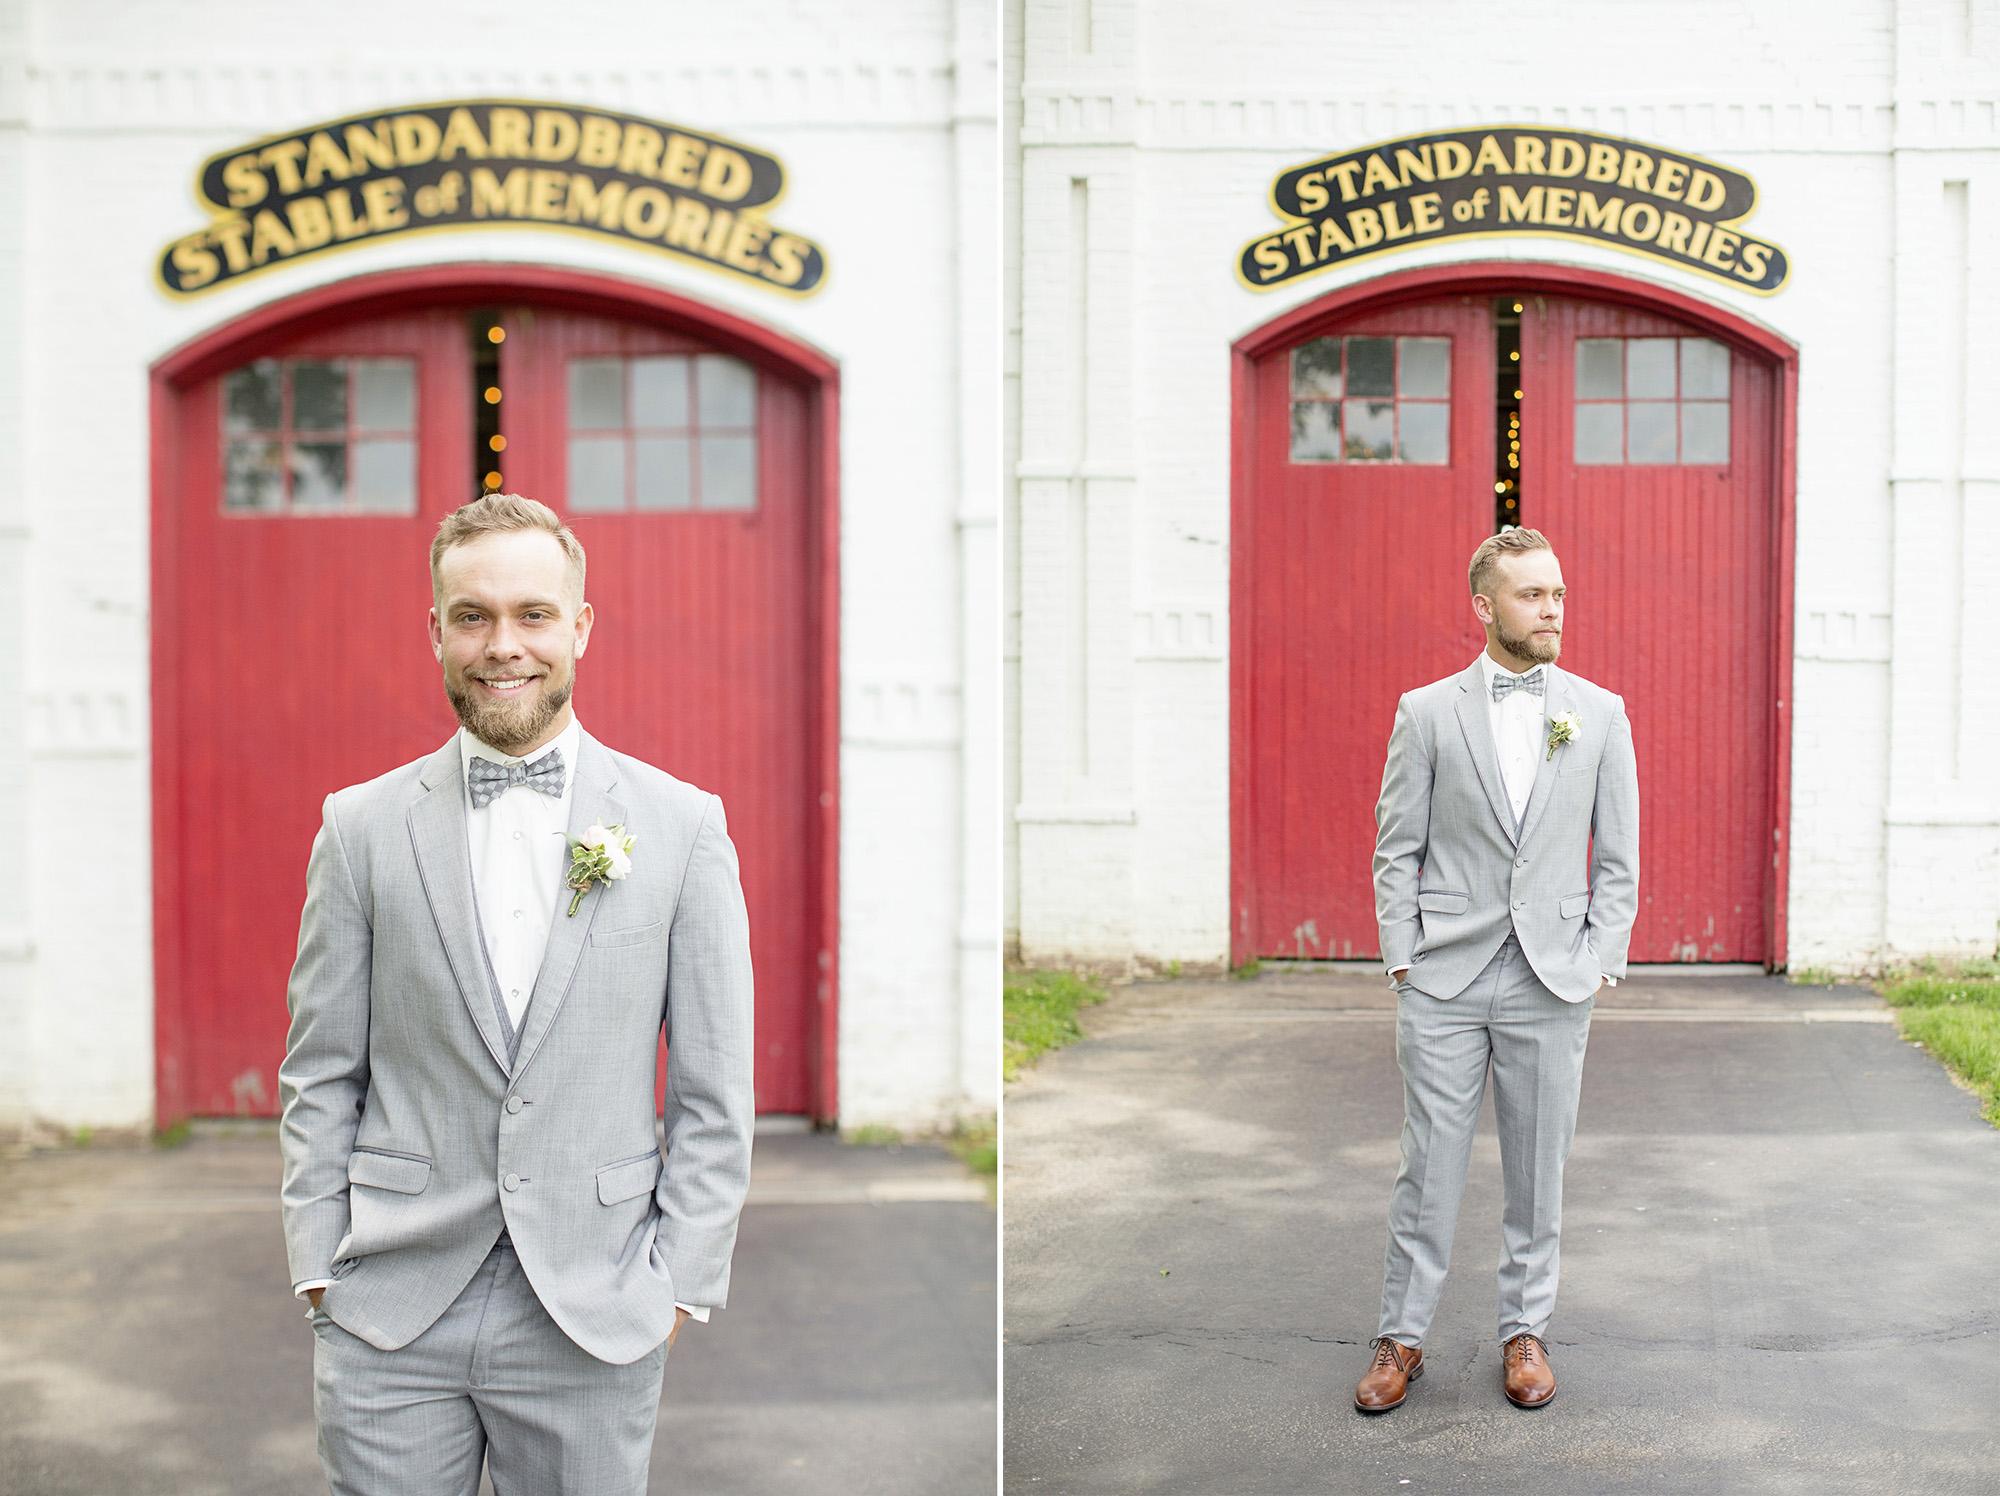 Seriously_Sabrina_Photography_Lexington_Kentucky_Round_Barn_Red_Mile_Stable_of_Memories_Wedding_Hart_35.jpg